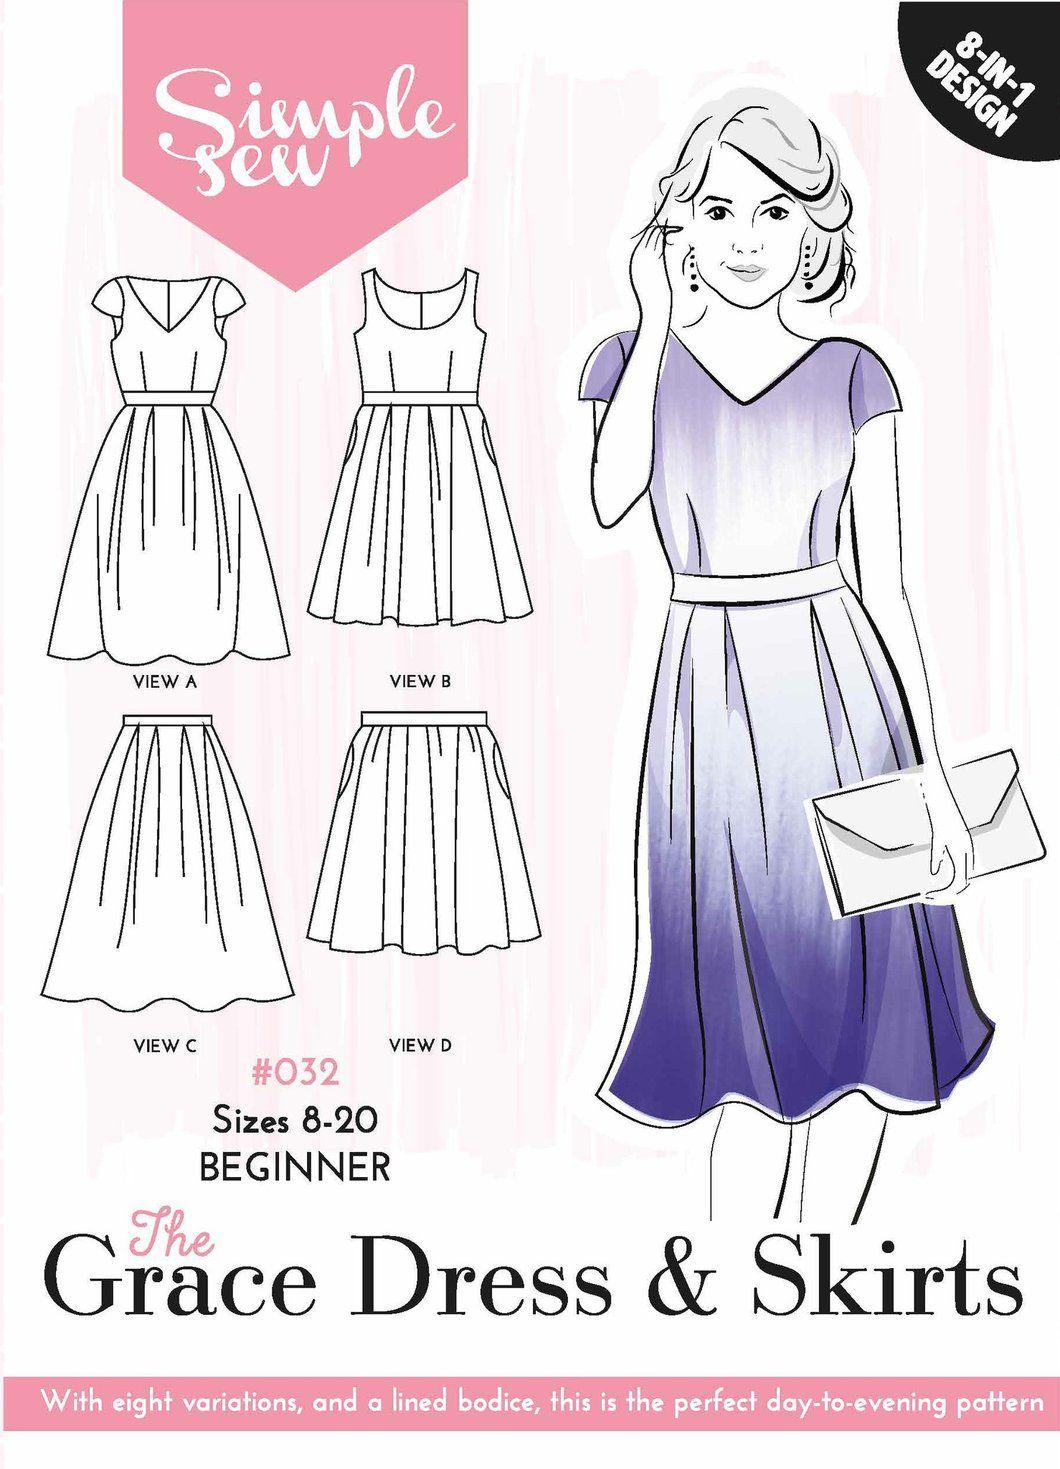 The simple sew grace dress u skirts dress skirt sewing patterns